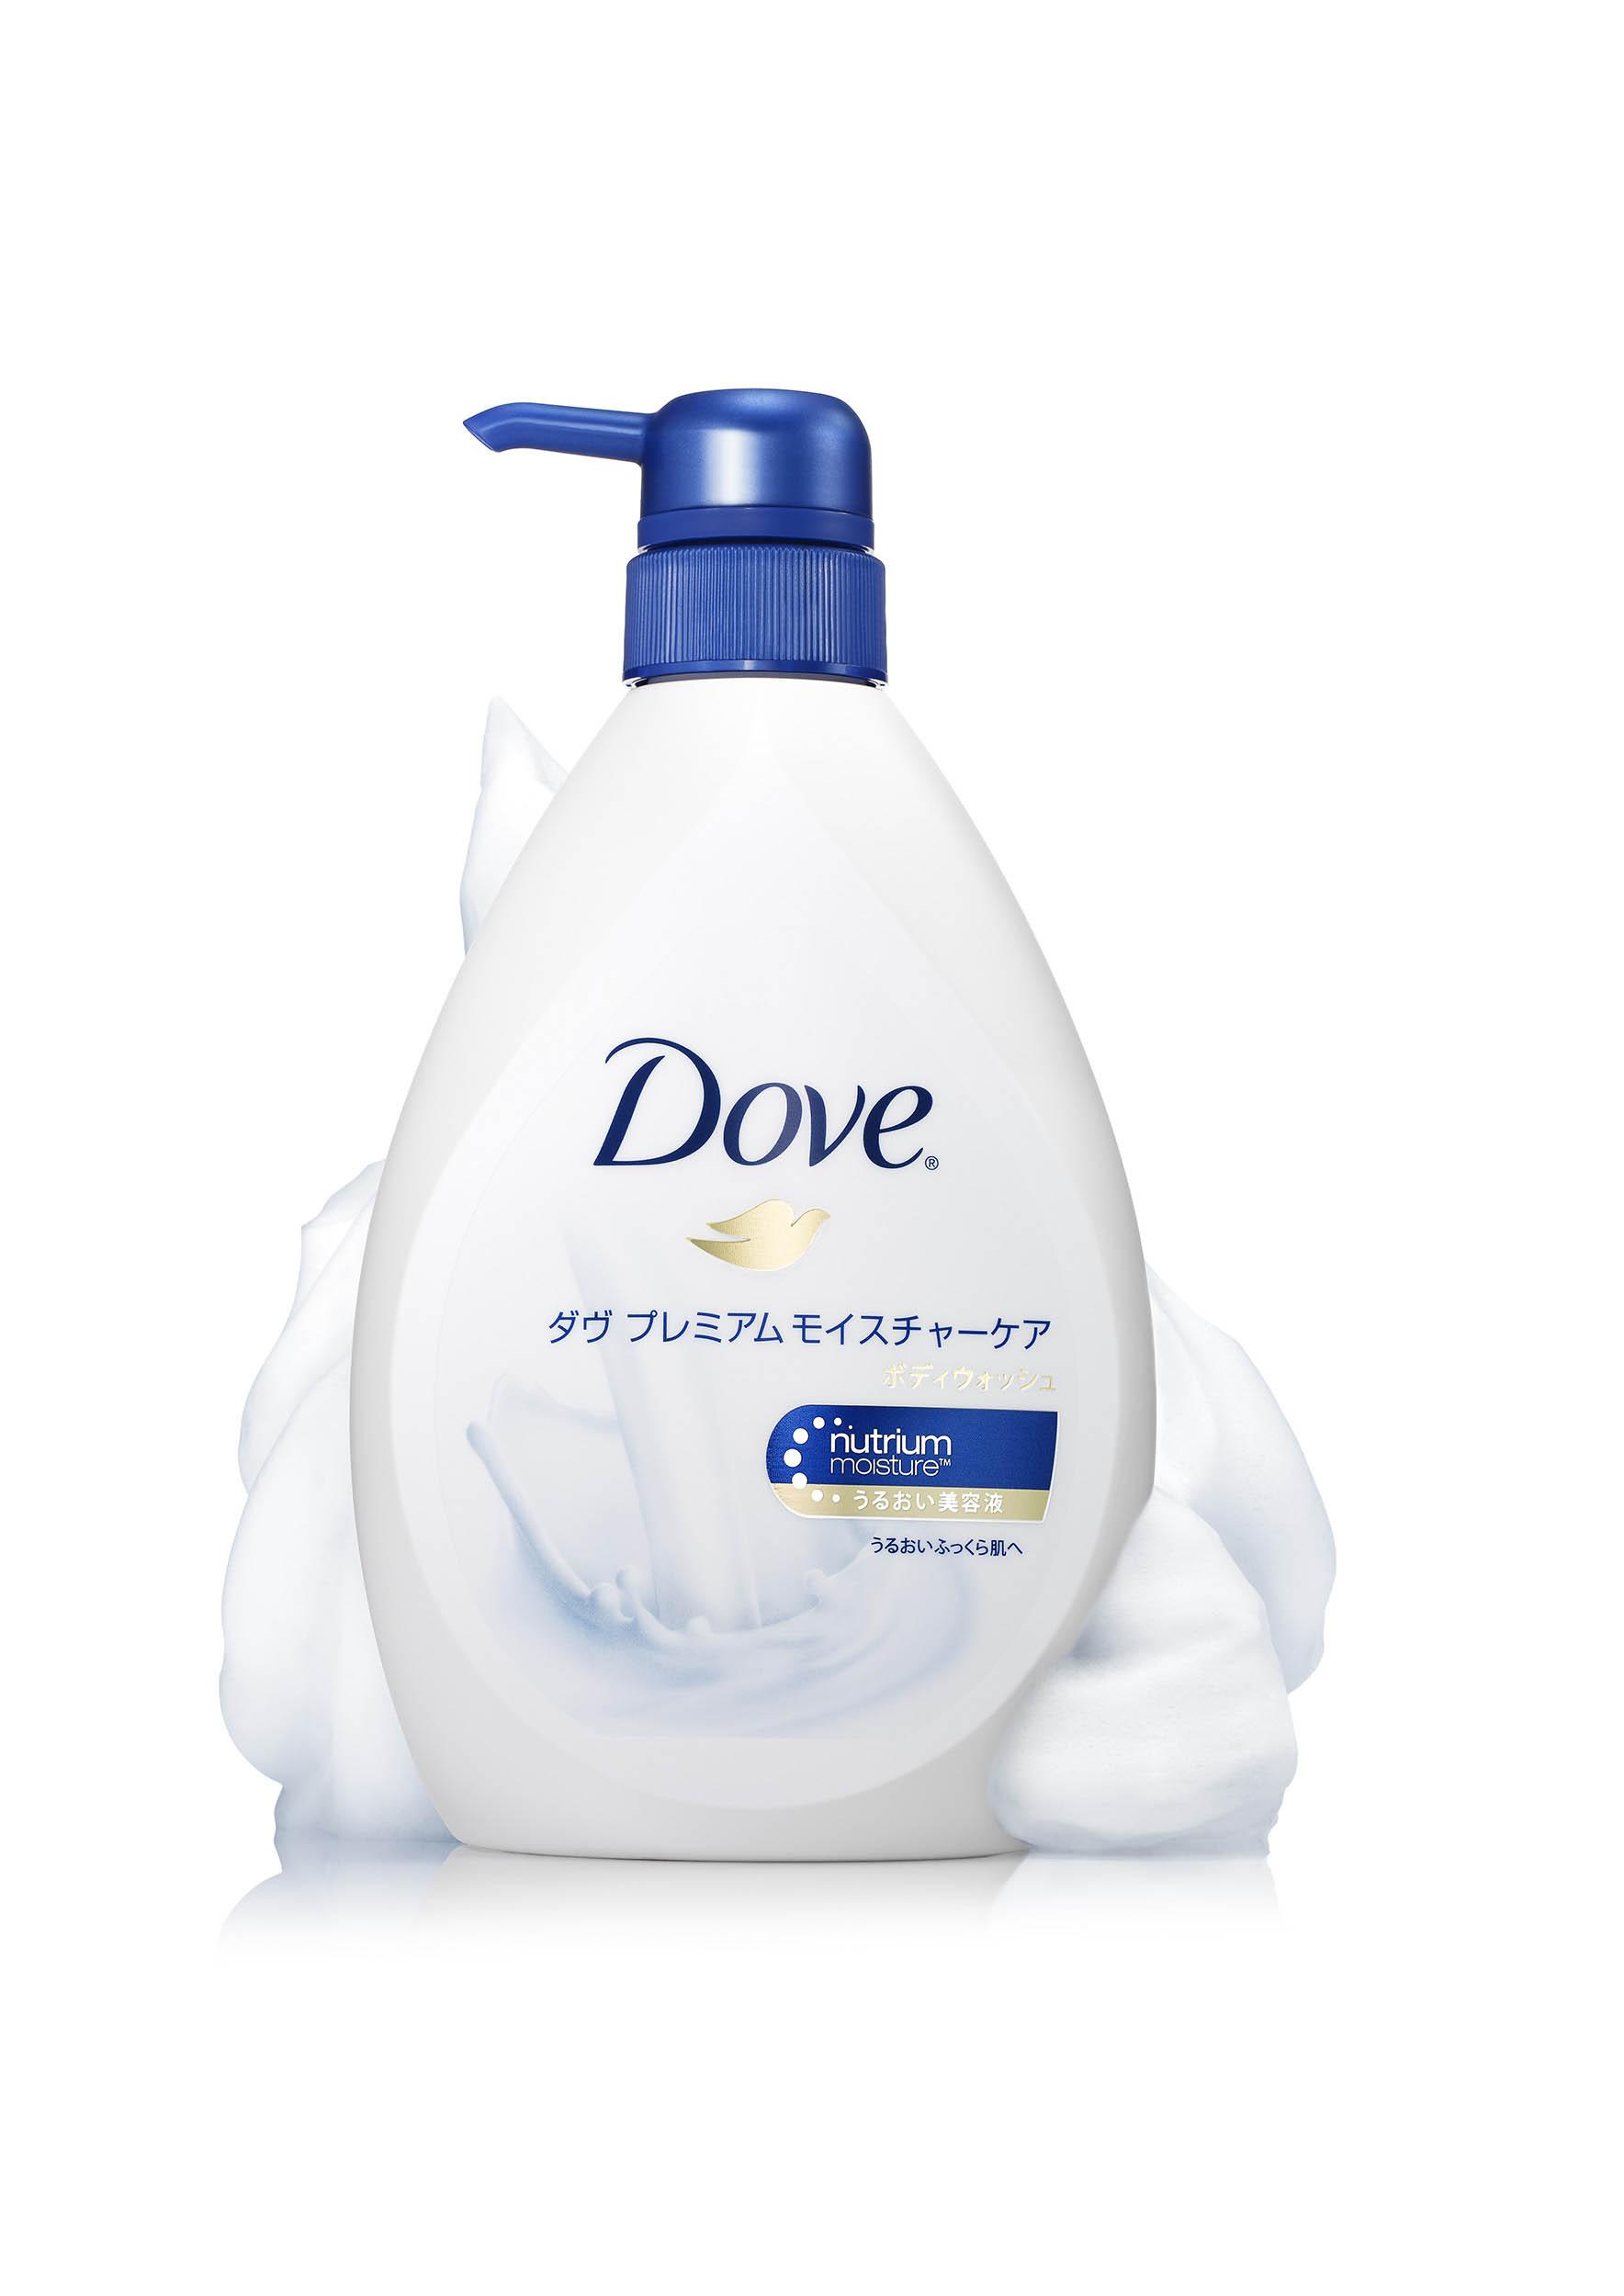 Dove2bc.jpg